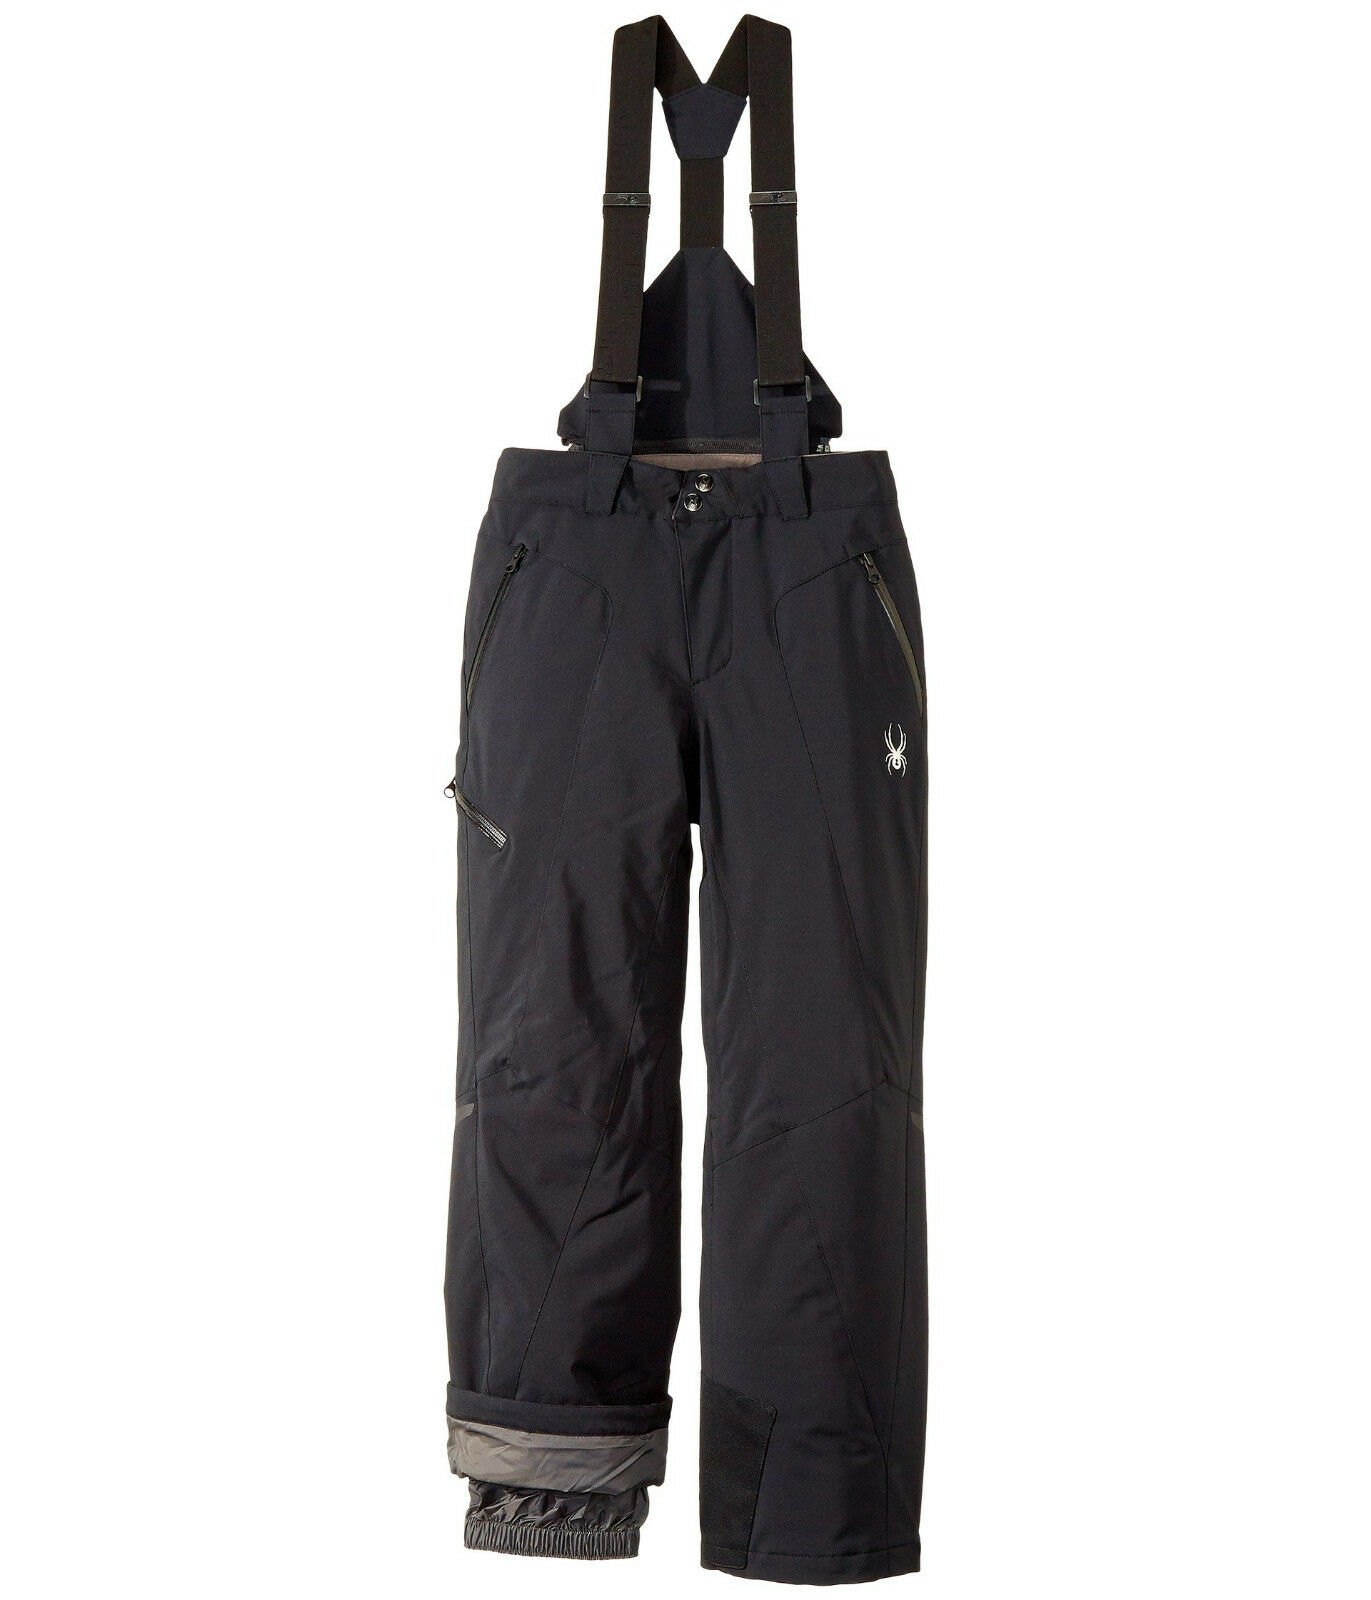 Spyder Boy's Bormio Pants, Kids Ski  Snowboarding Pant, Size 10, NWT  best choice